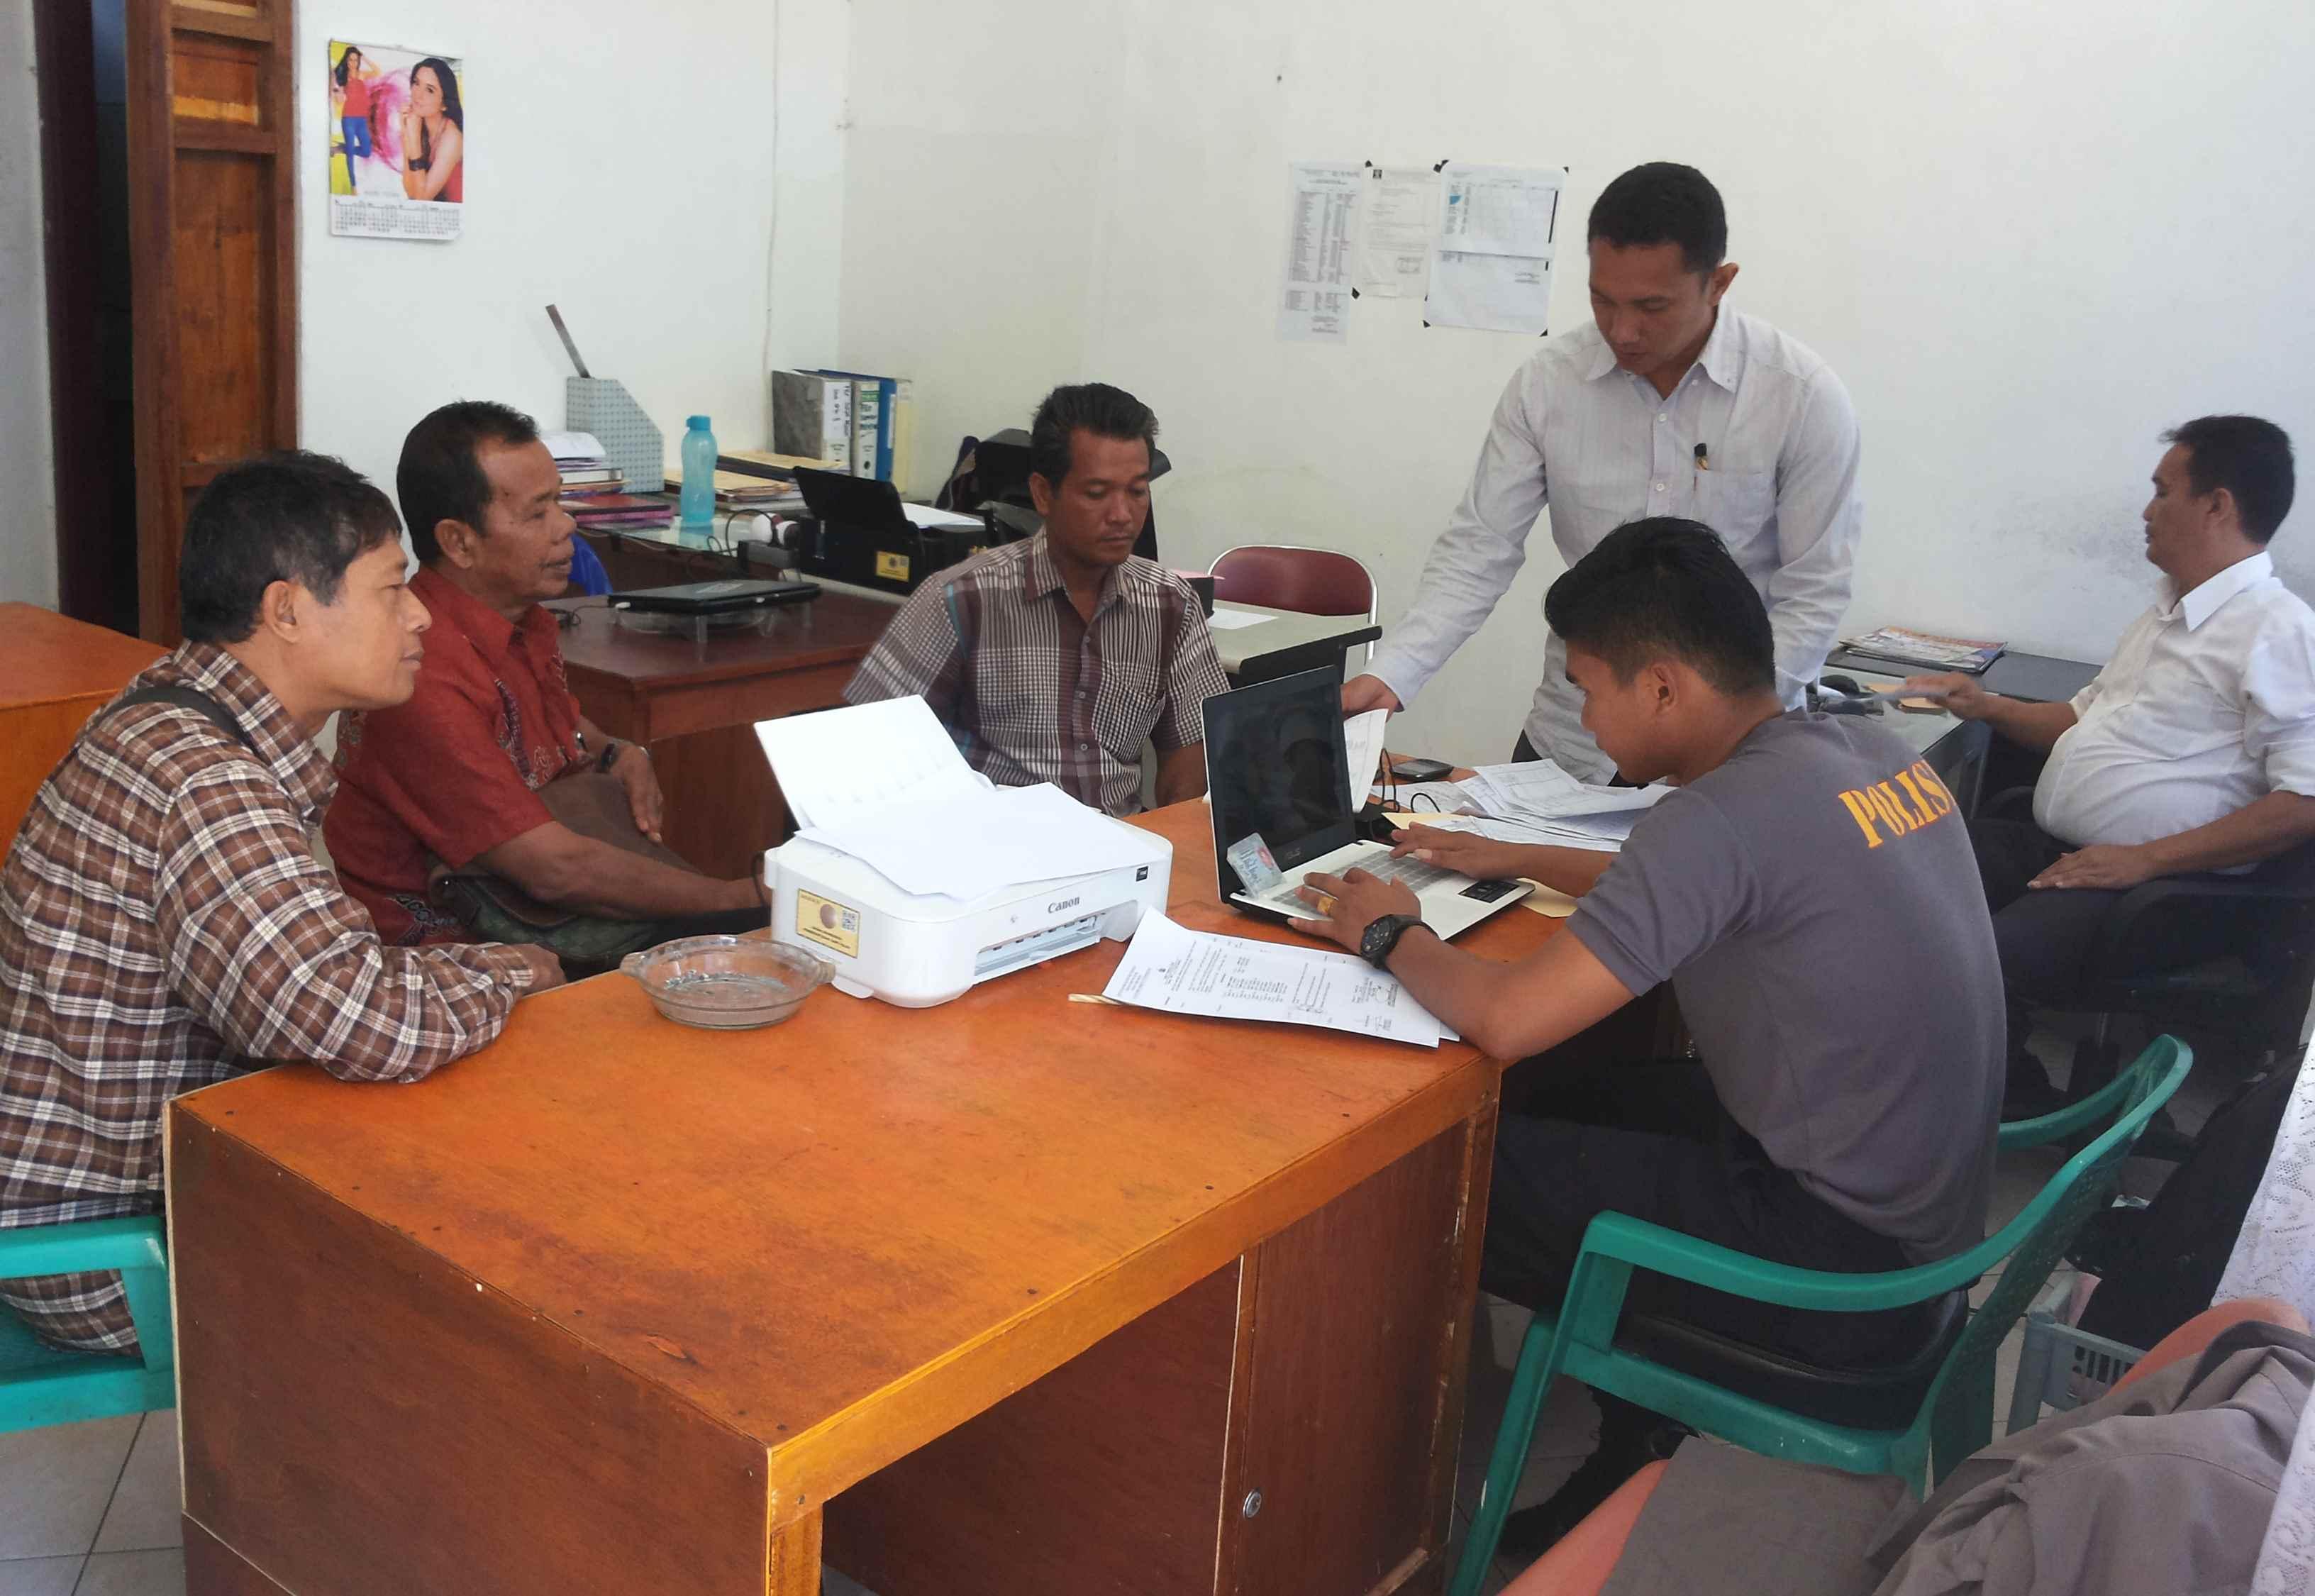 5 Tahun Urus Sertifikat Prona Tak Kunjung Selesai, Sejumlah Warga Laporkan Kepala Desa Ke Polisi